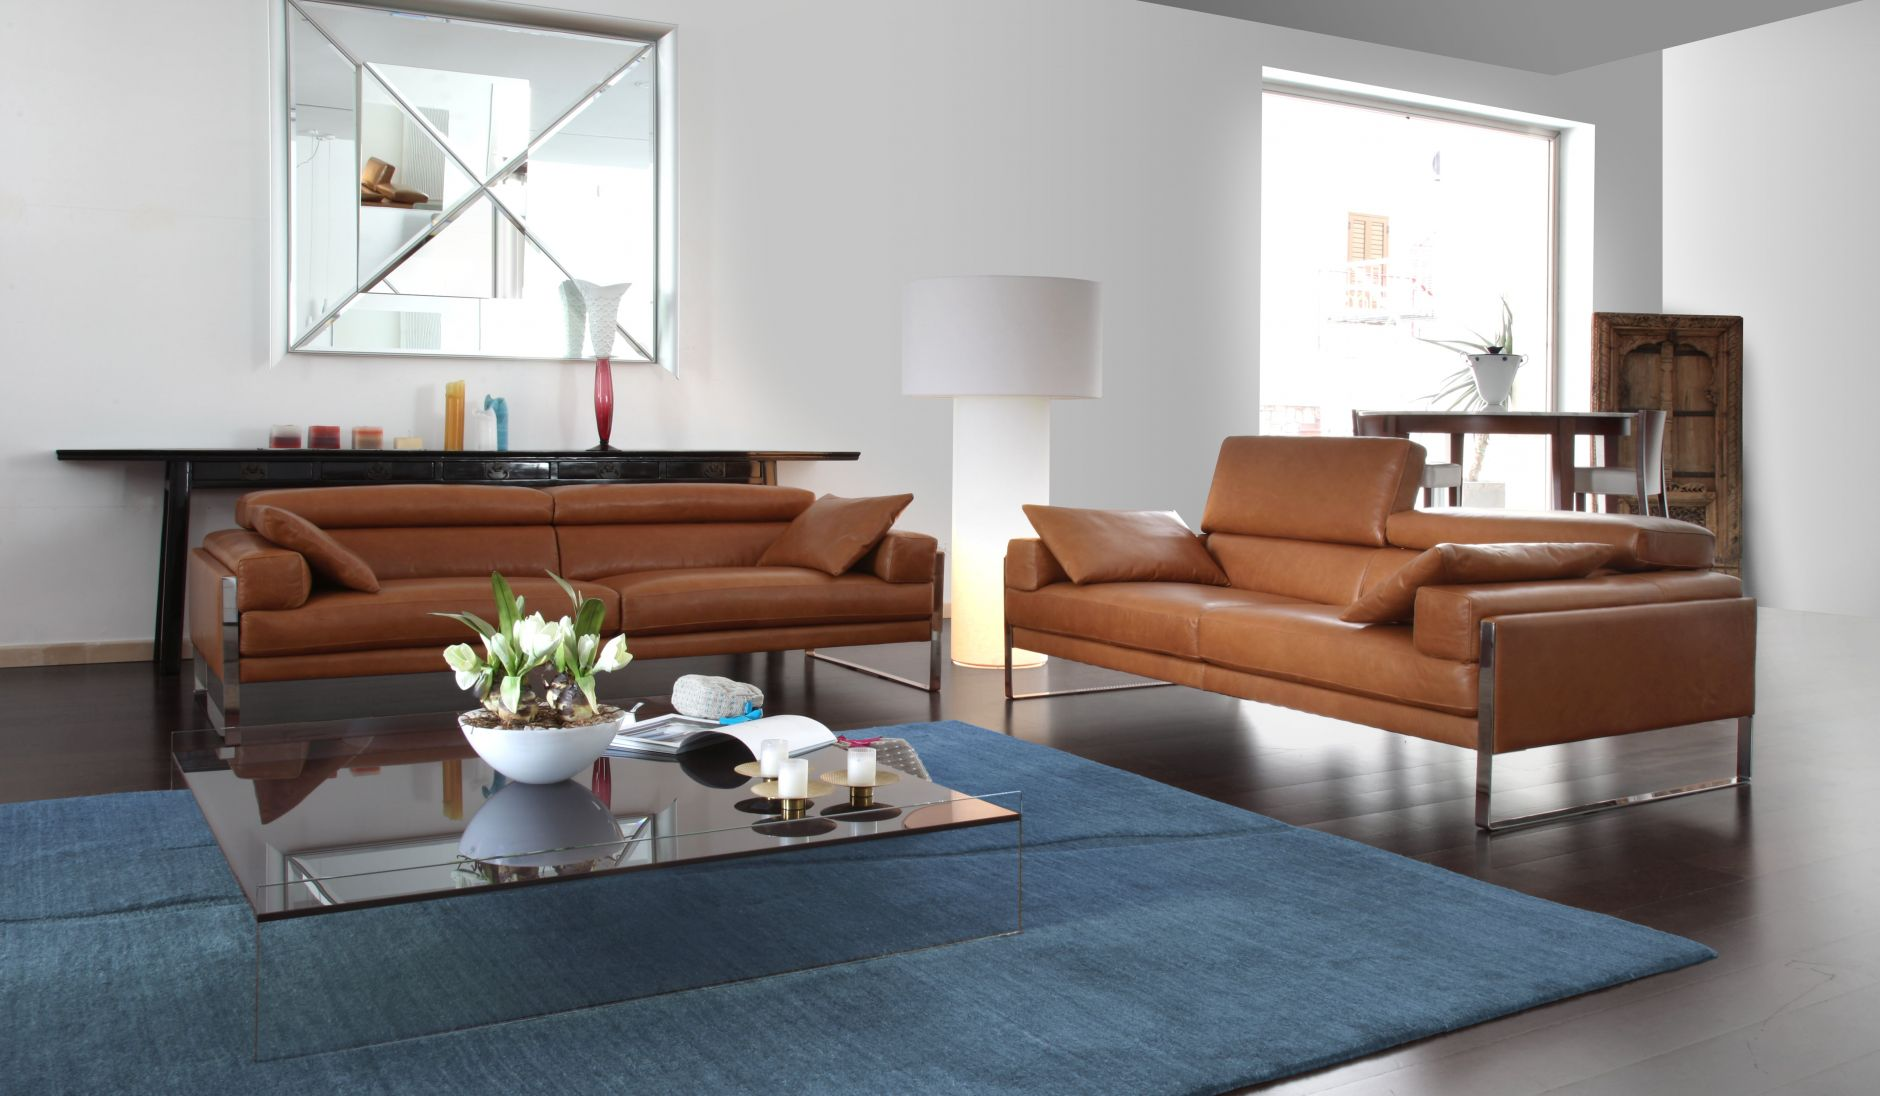 canap s italiens canap calia italia s rie romeo 808les. Black Bedroom Furniture Sets. Home Design Ideas